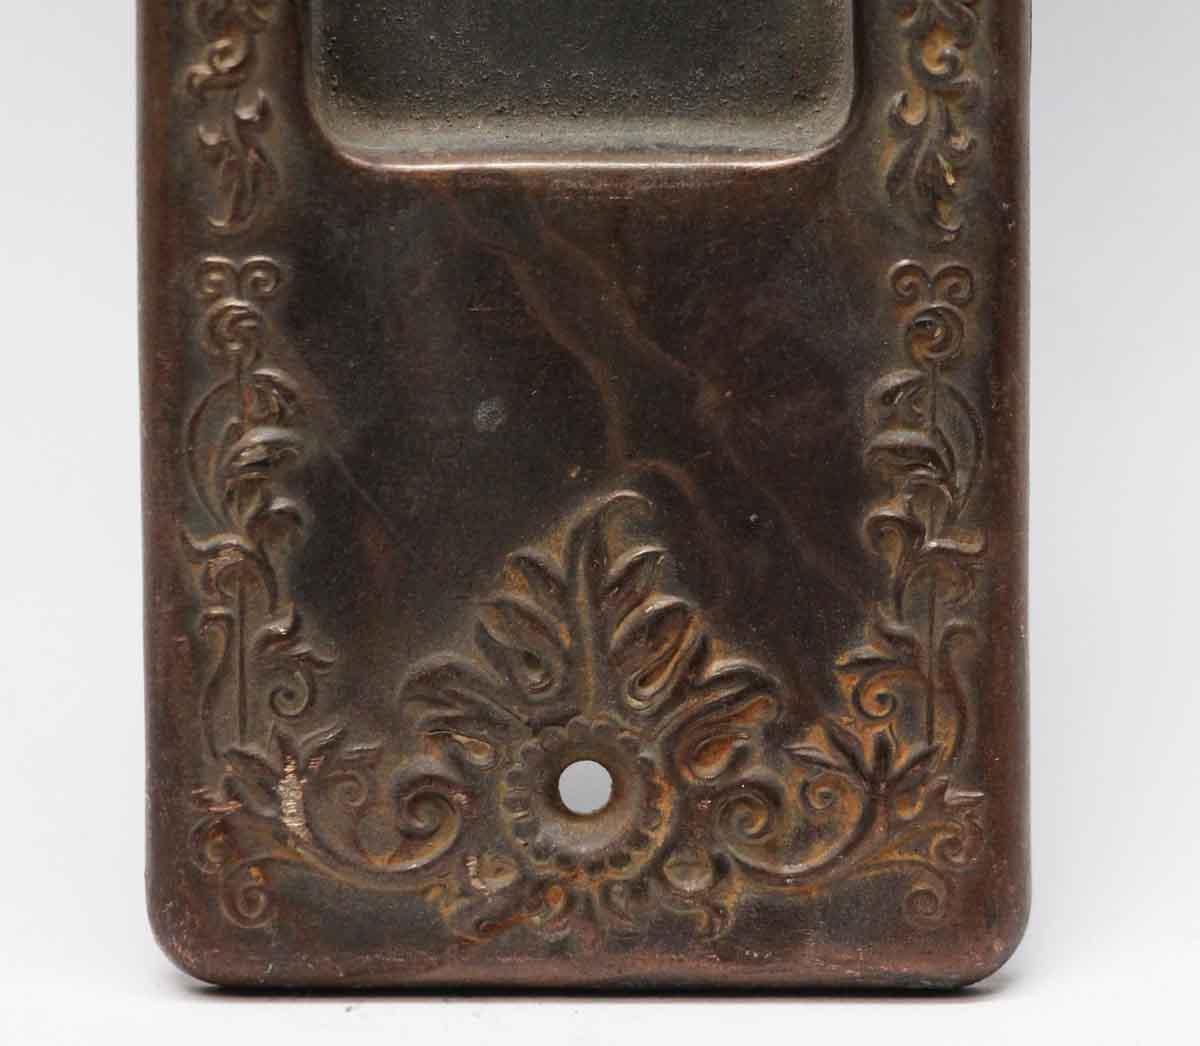 Pocket Door Hardware for Sale - N253978 - Antique Pocket Door Plate With Keyhole Olde Good Things